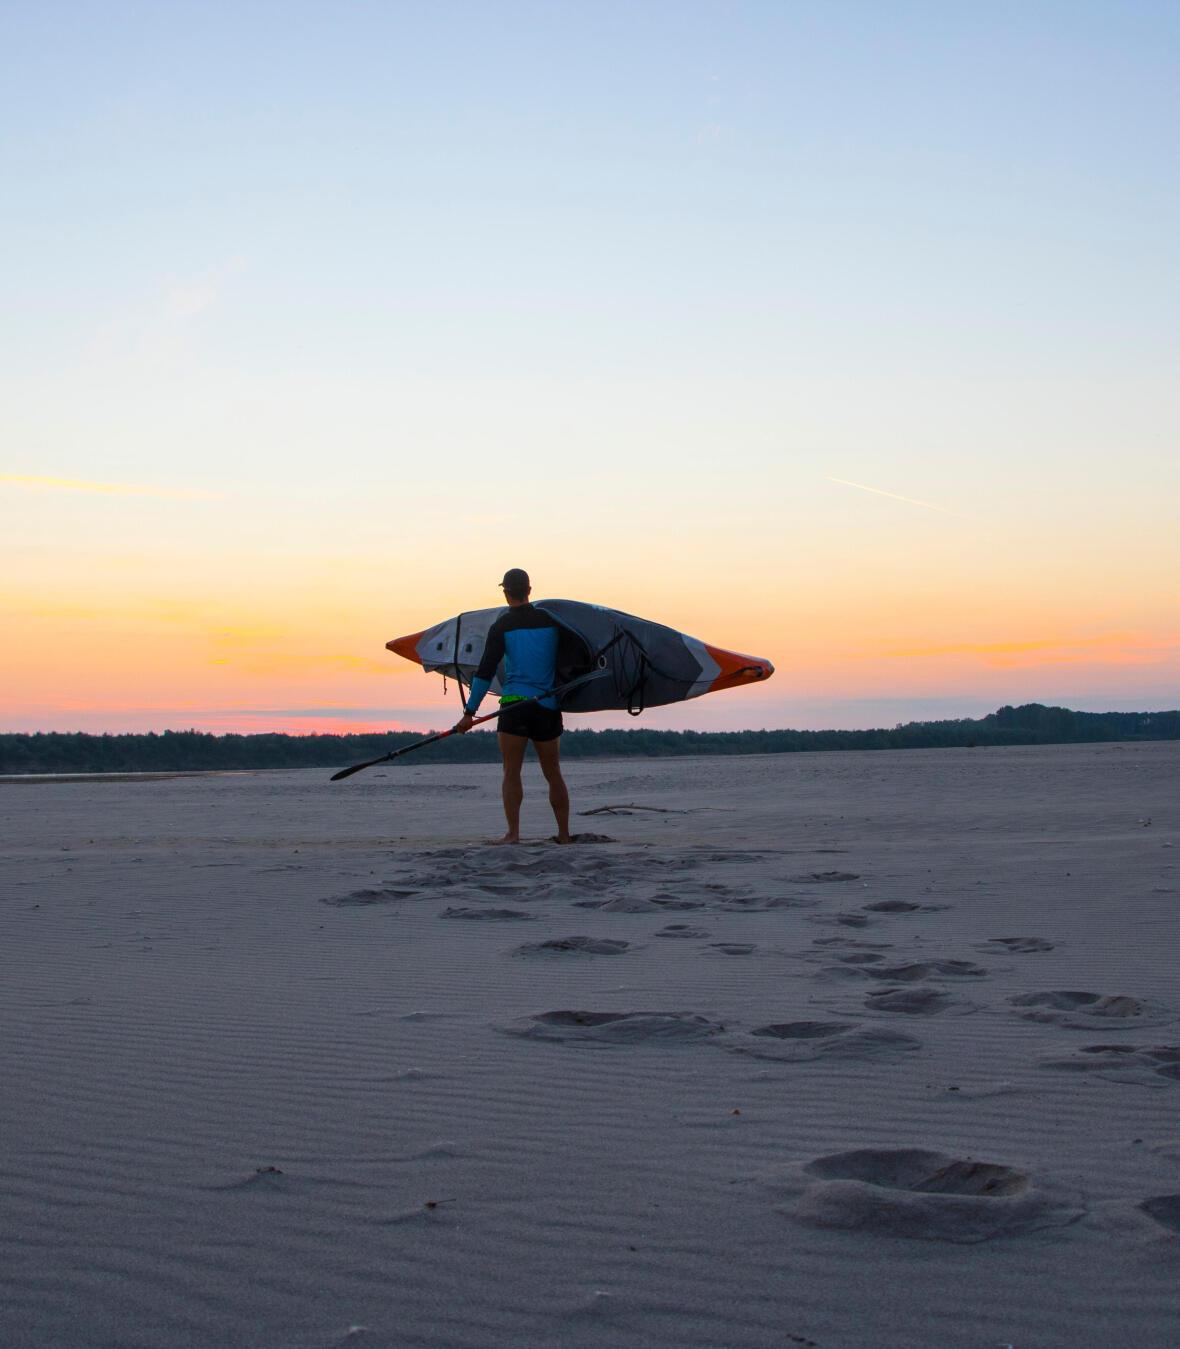 kayak gonflable trip preparation